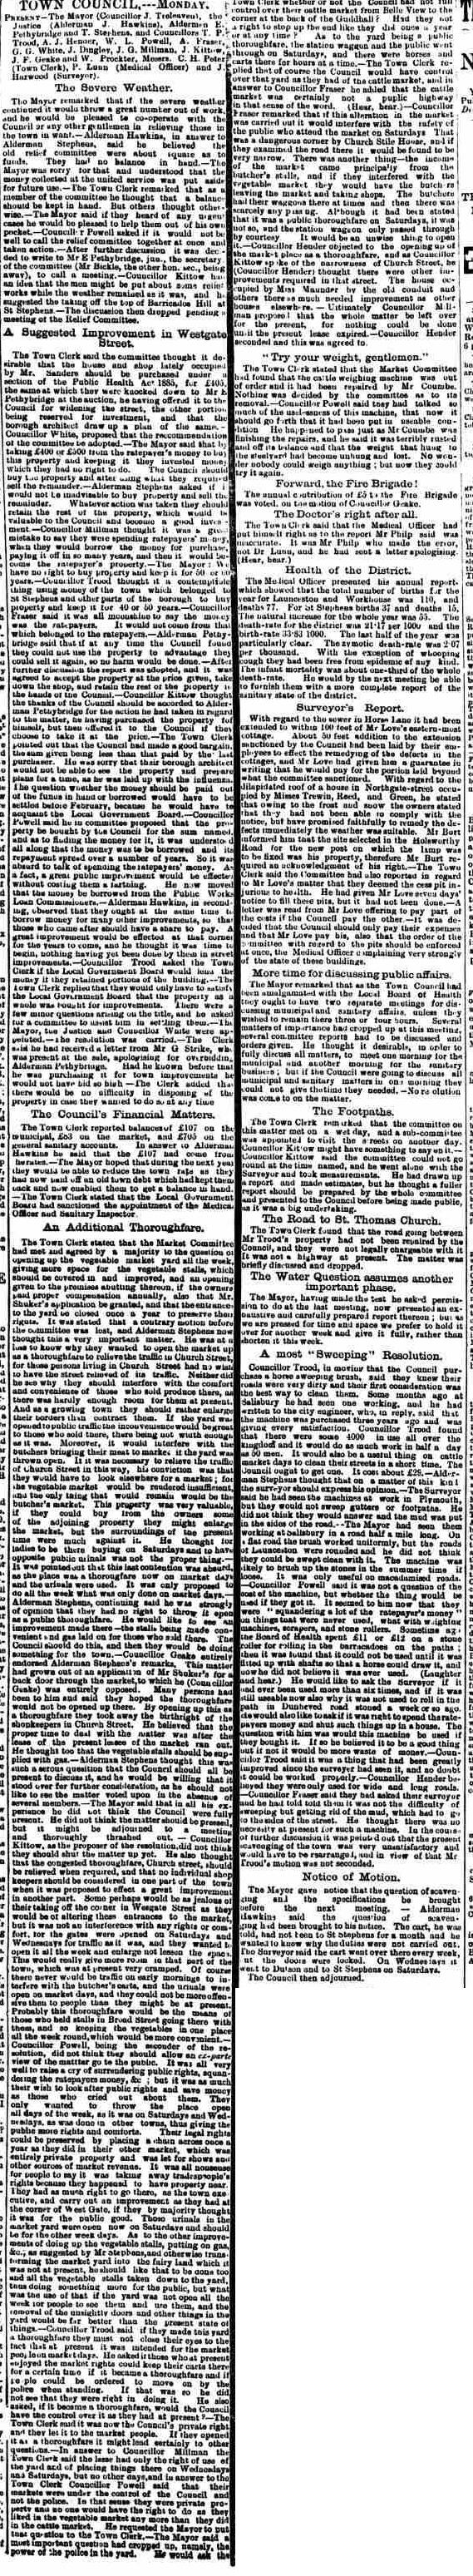 15 January 1892